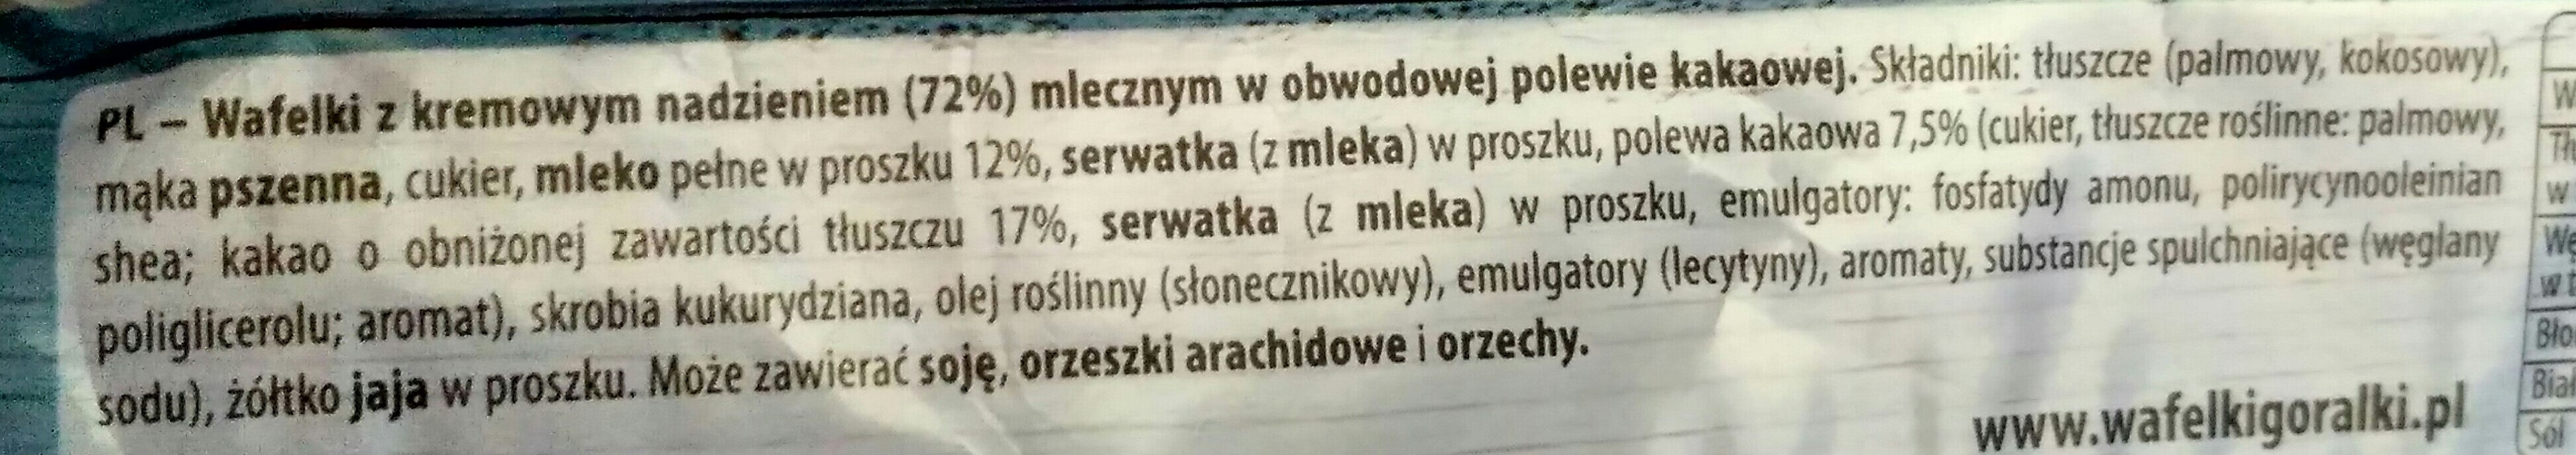 Góralki Mleczne - Składniki - pl